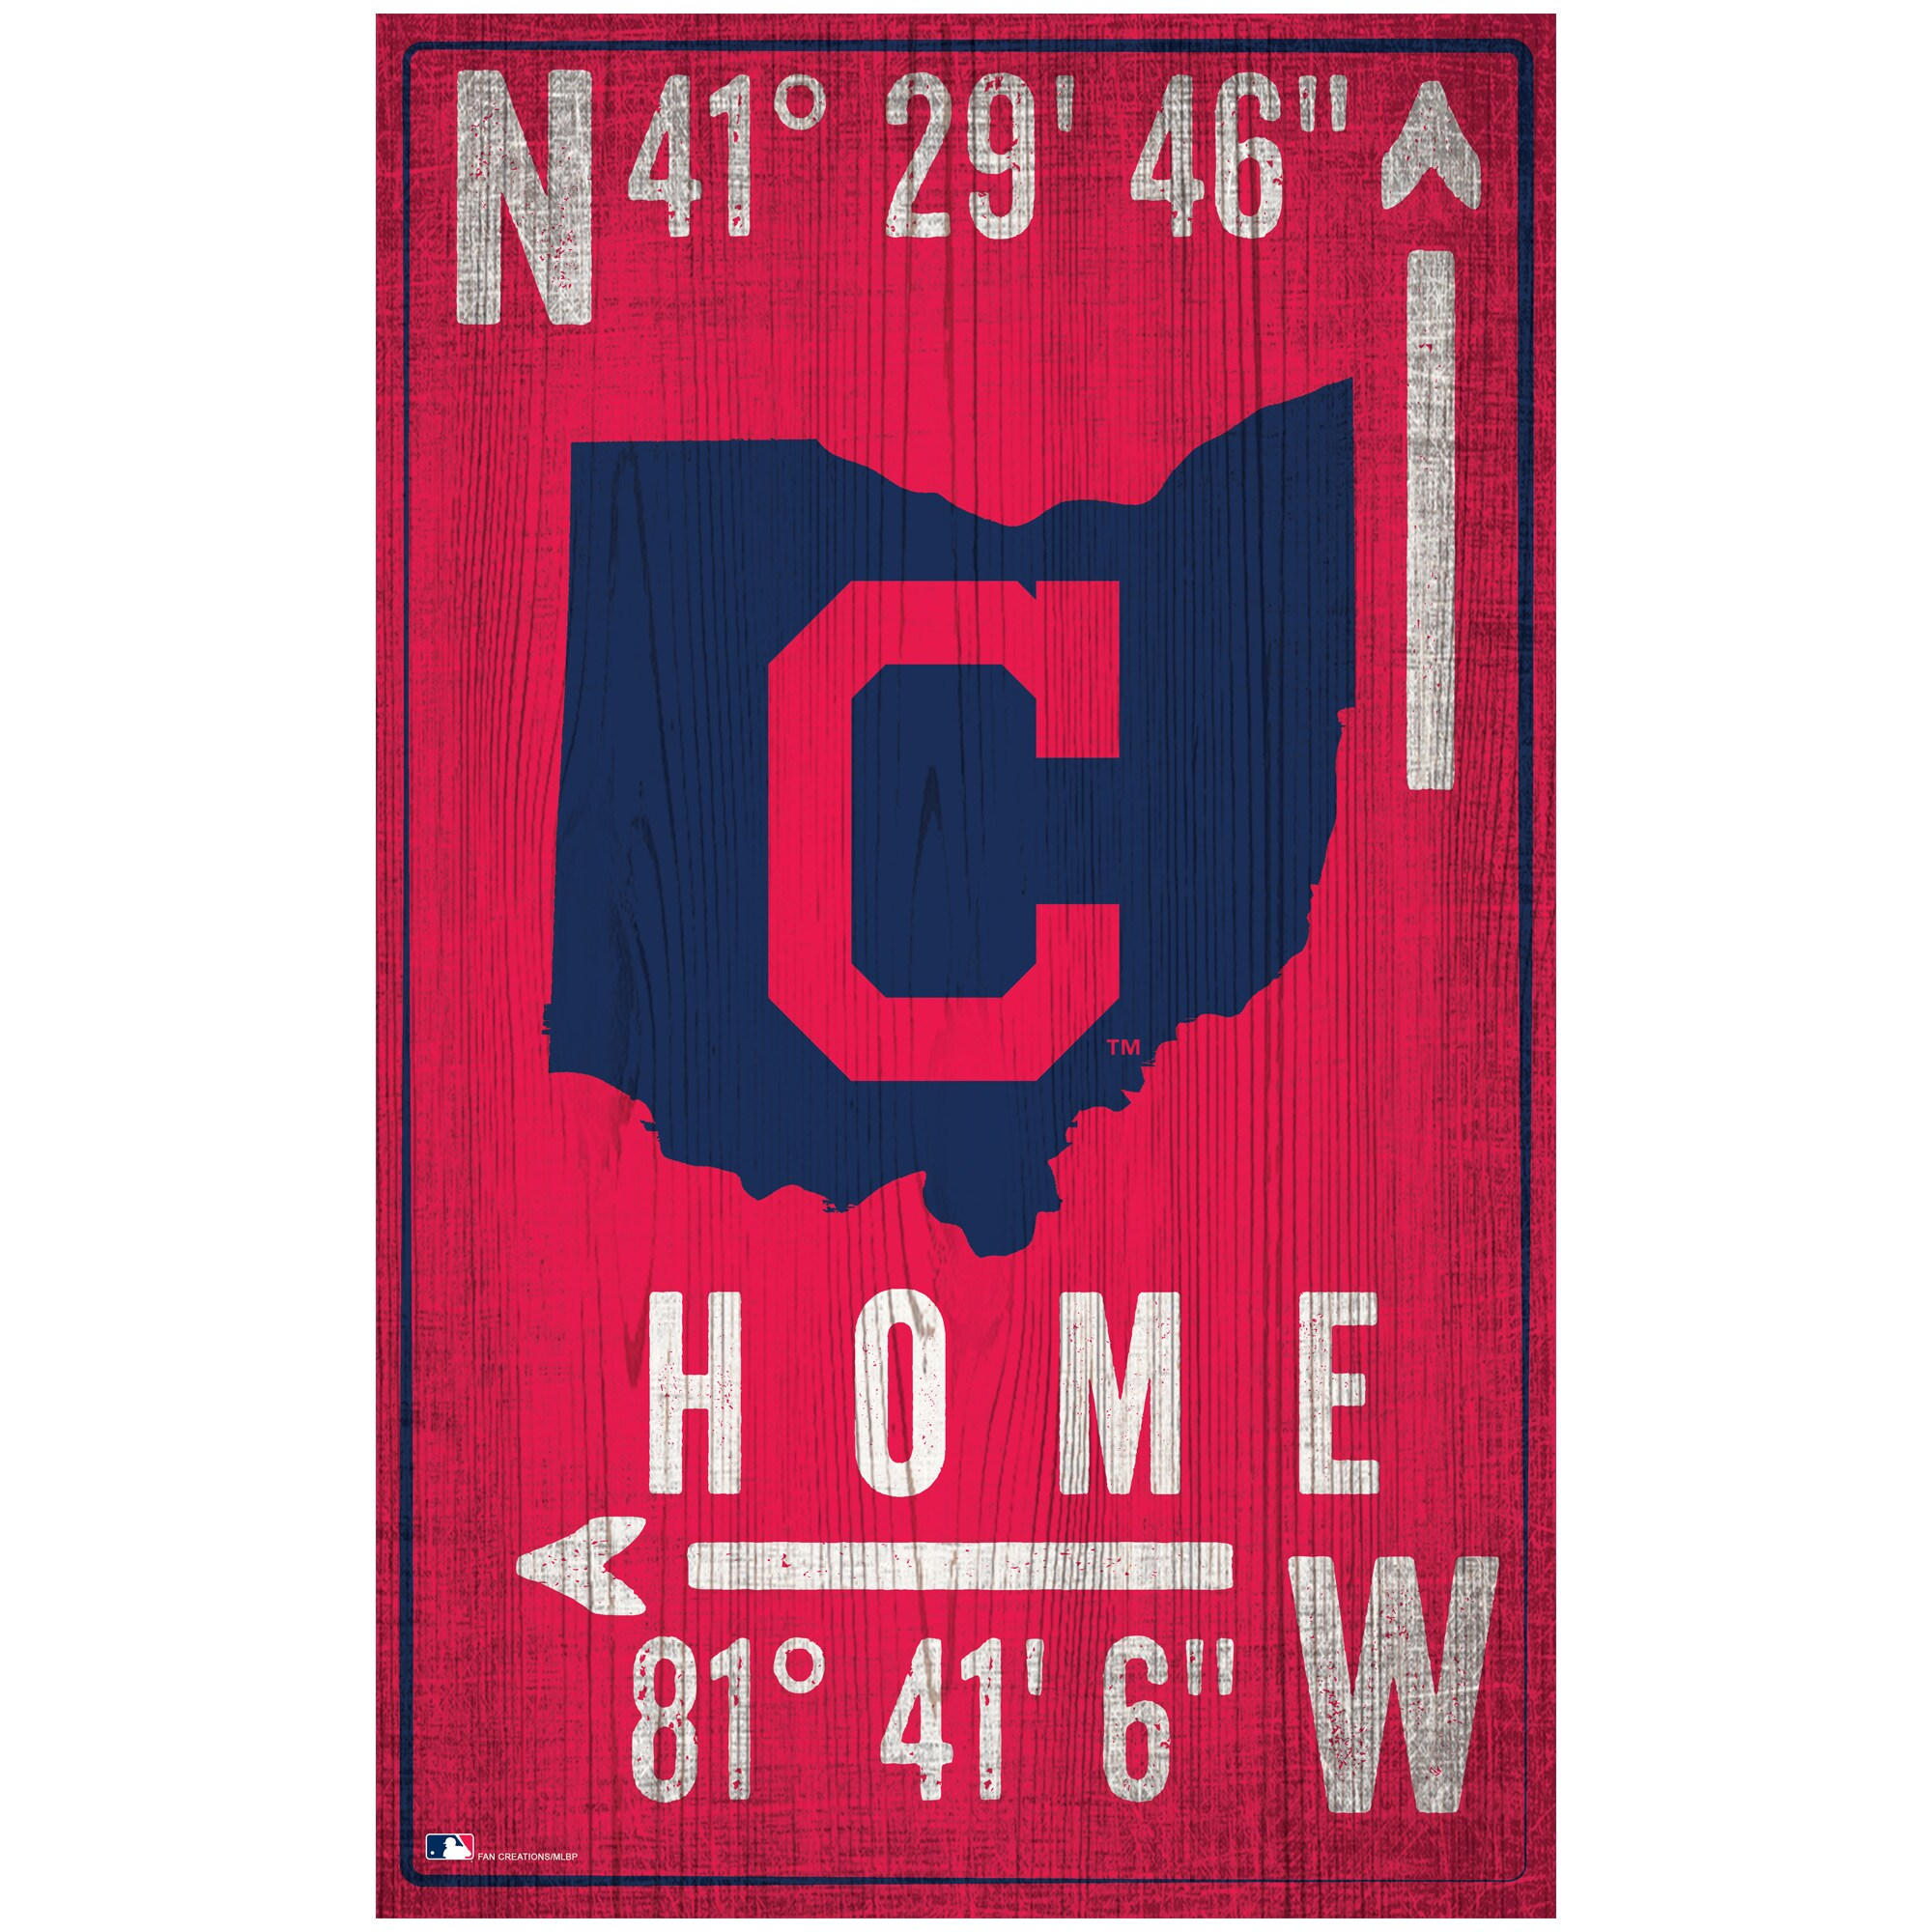 "Cleveland Indians 11"" x 19"" Coordinate Sign"